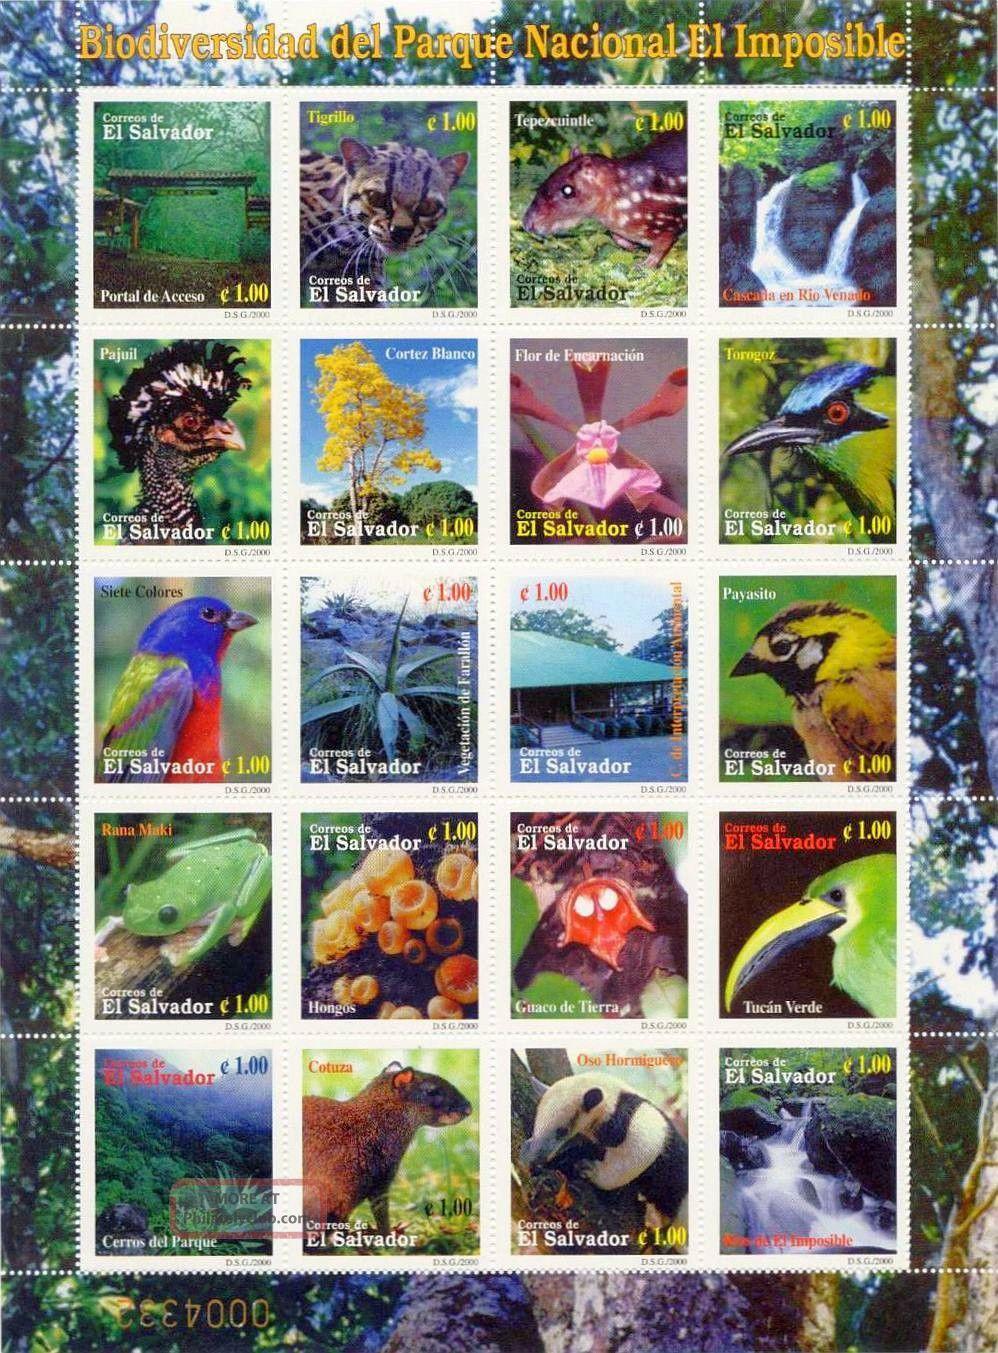 El Salvador 2000 Sc 1538 El Imposible Natl Park 20 Stamp Sheet,  Fauna,  Flora Latin America photo